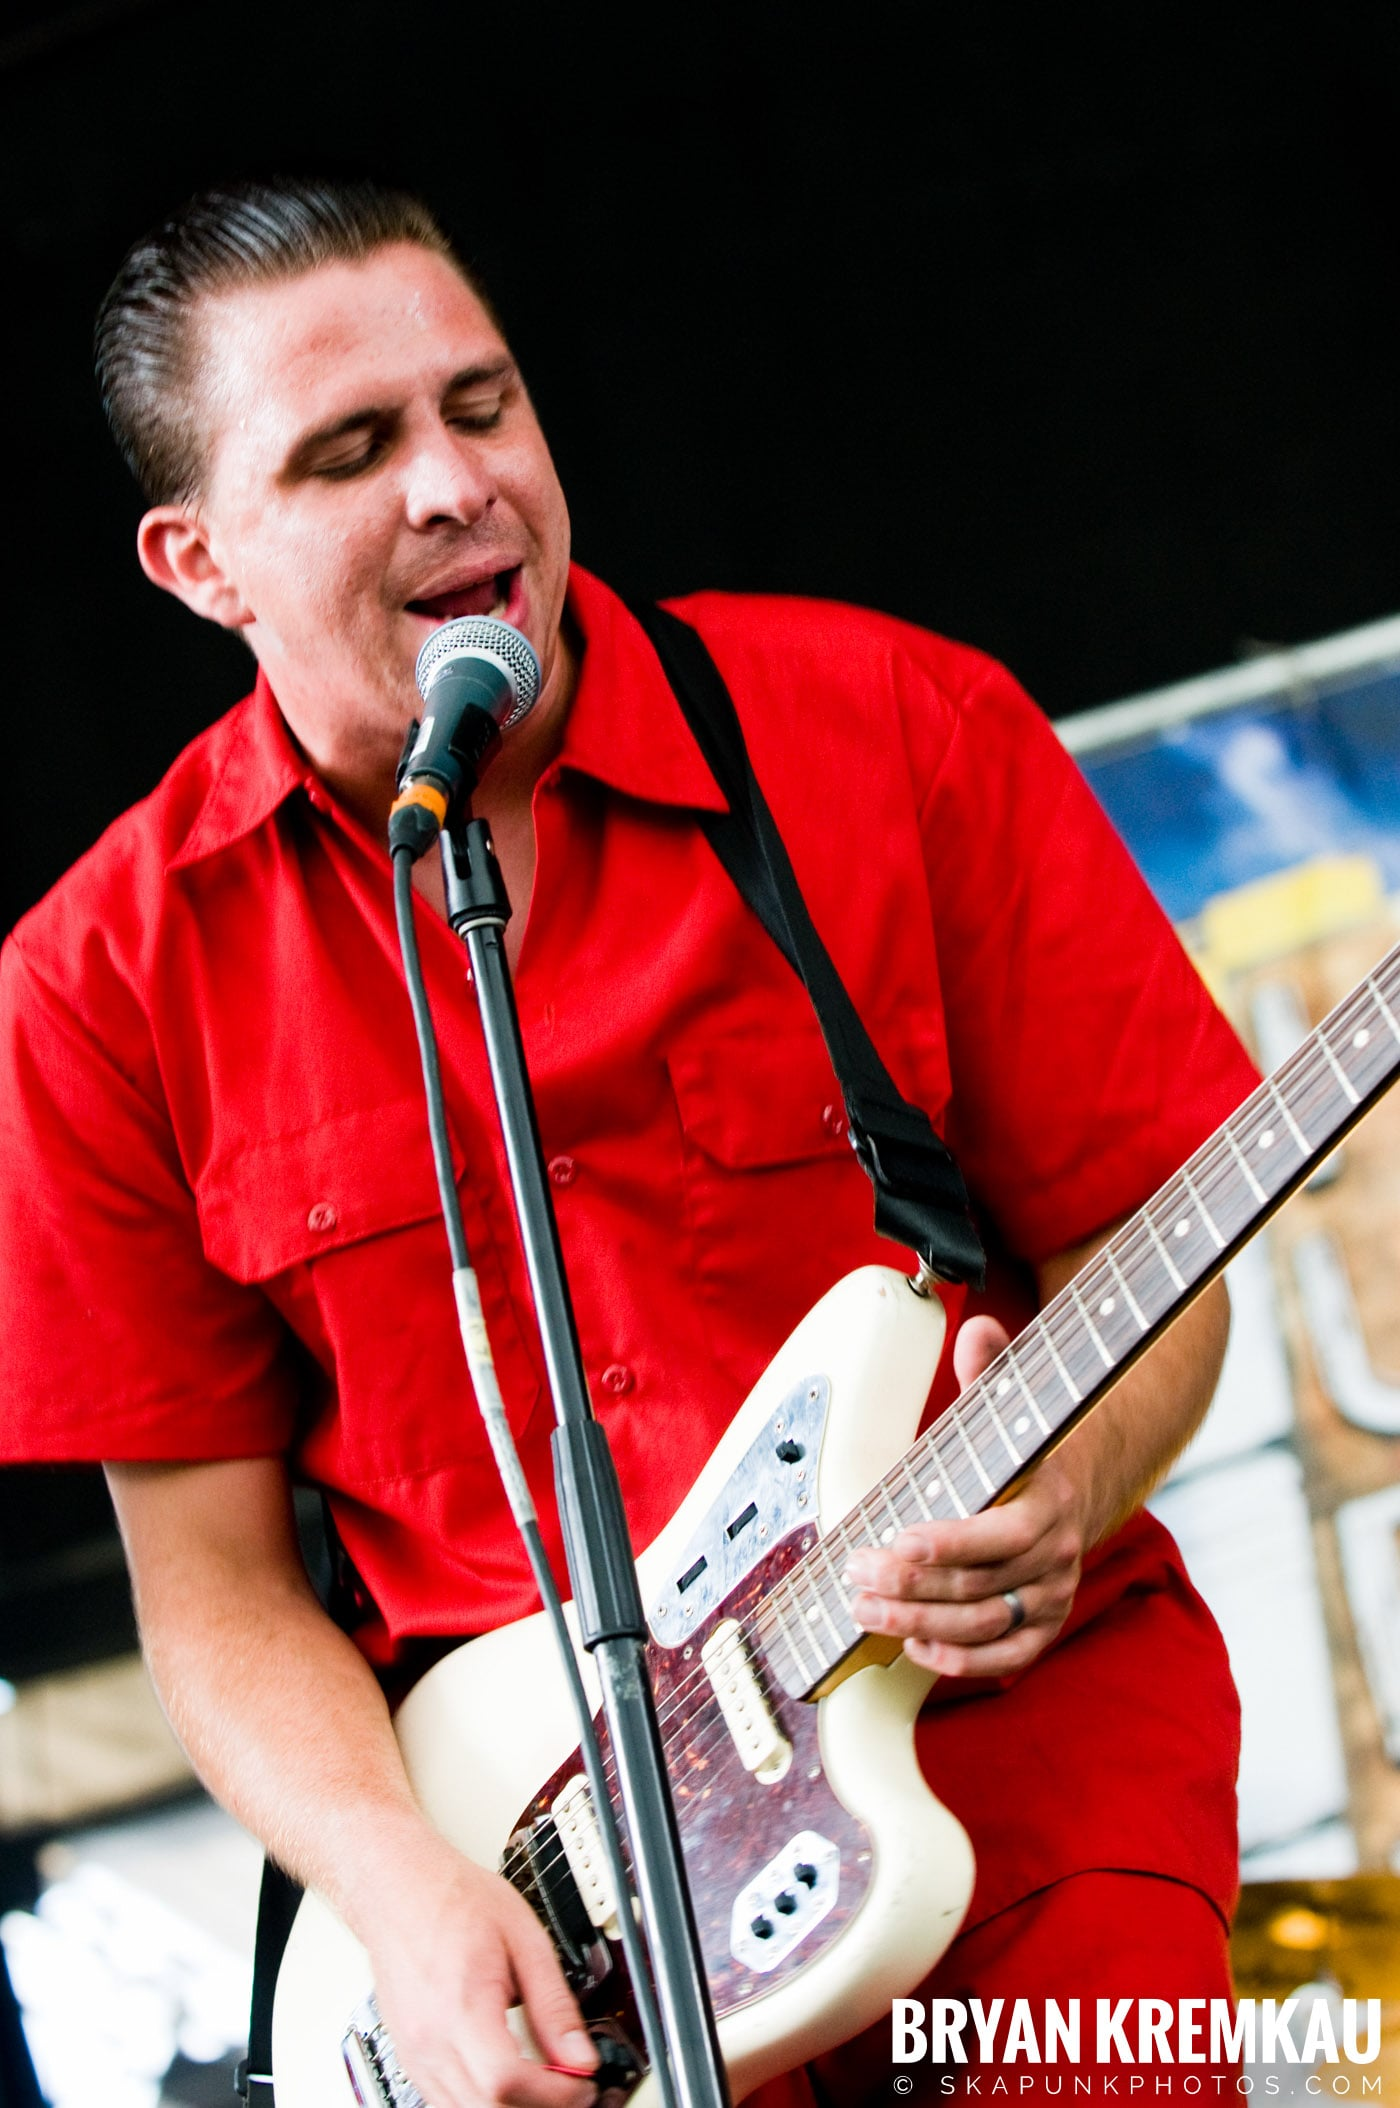 The Aggrolites @ Warped Tour 08, Scranton PA - 7.27.08 (10)